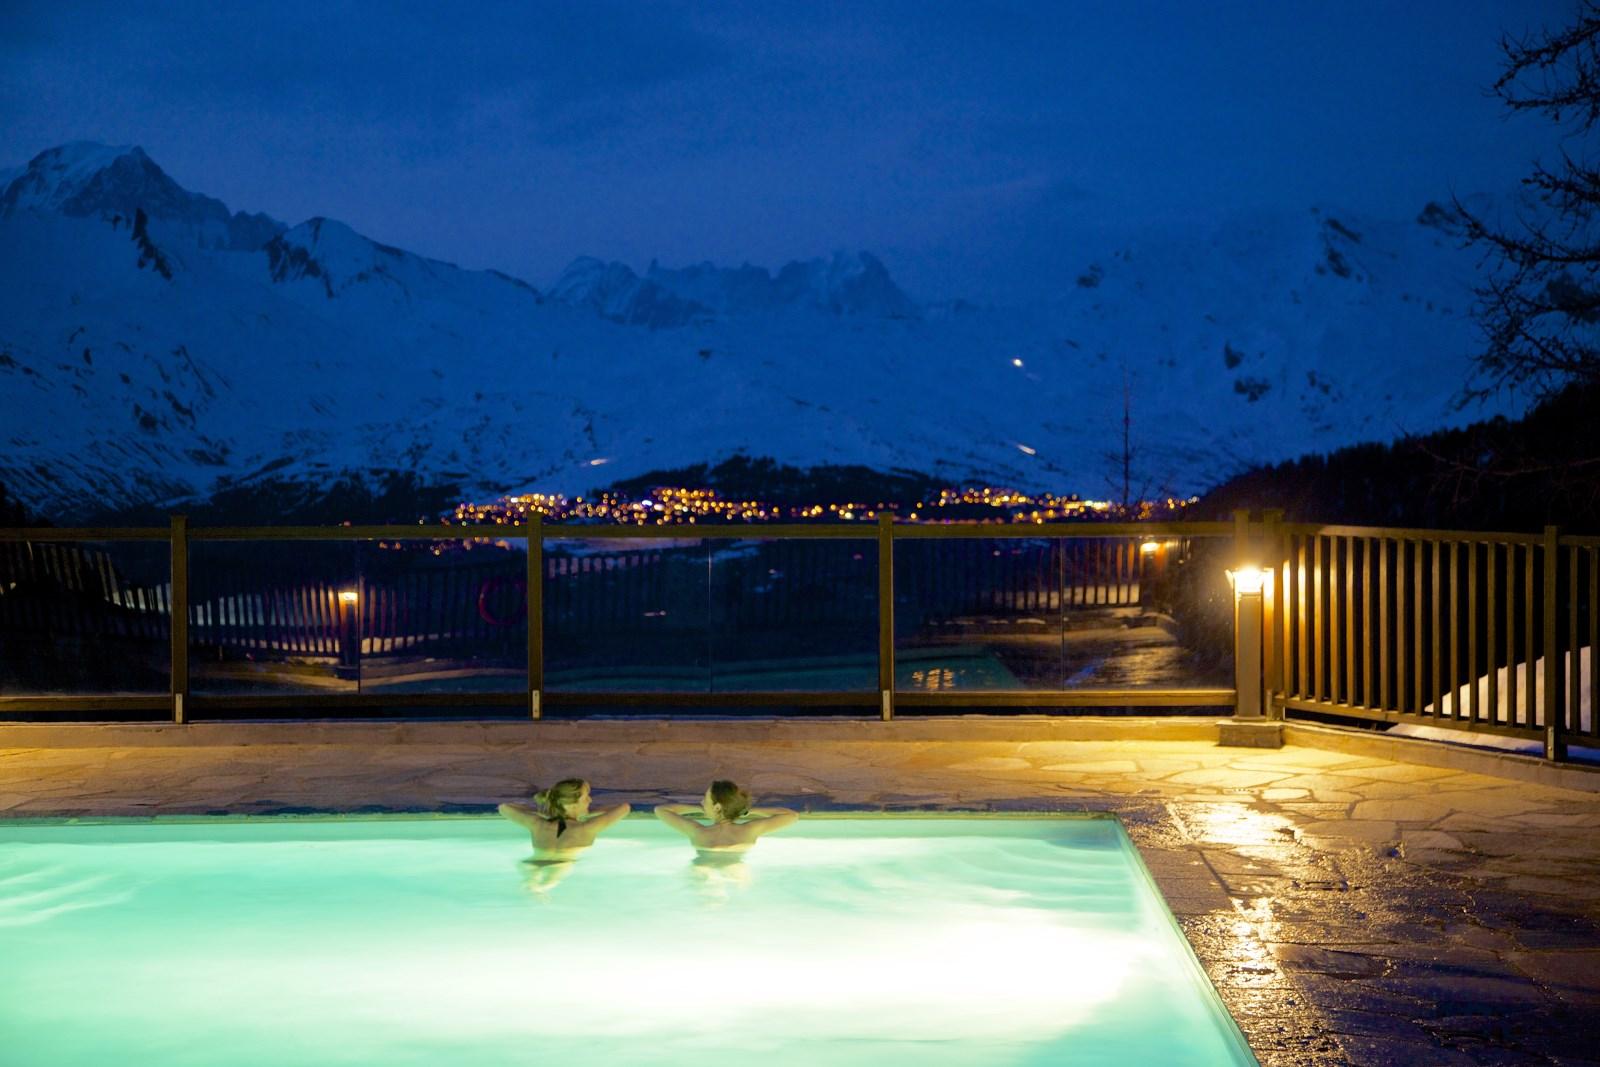 Hotel spa la montagne hotel avec spa et piscine en for Hotel piscine interieure rhone alpes